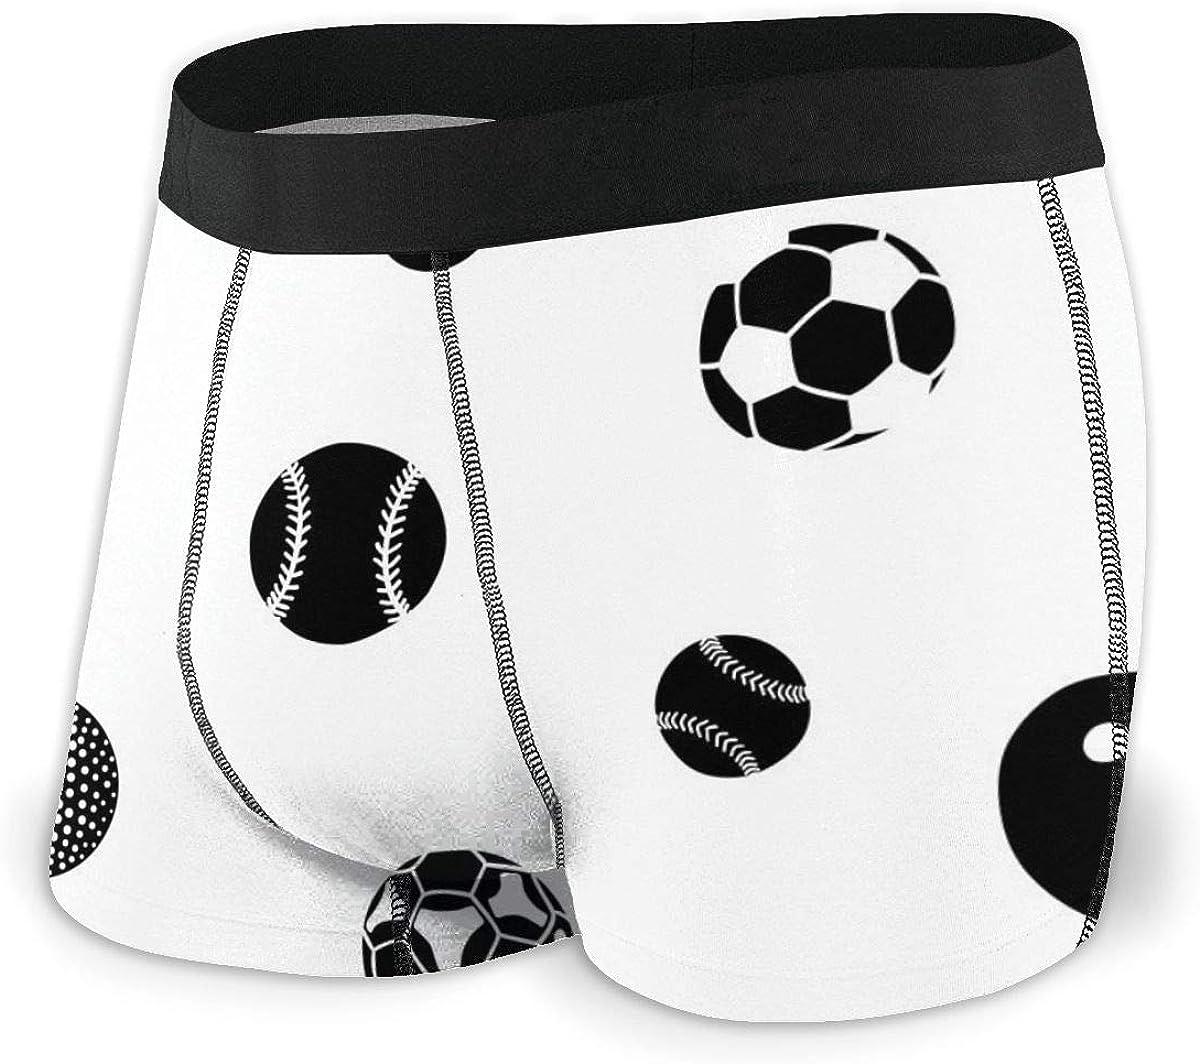 Mens Boxer Briefs Sports Balls American Football Boys Trunks Underwear Short Leg Breathable Man